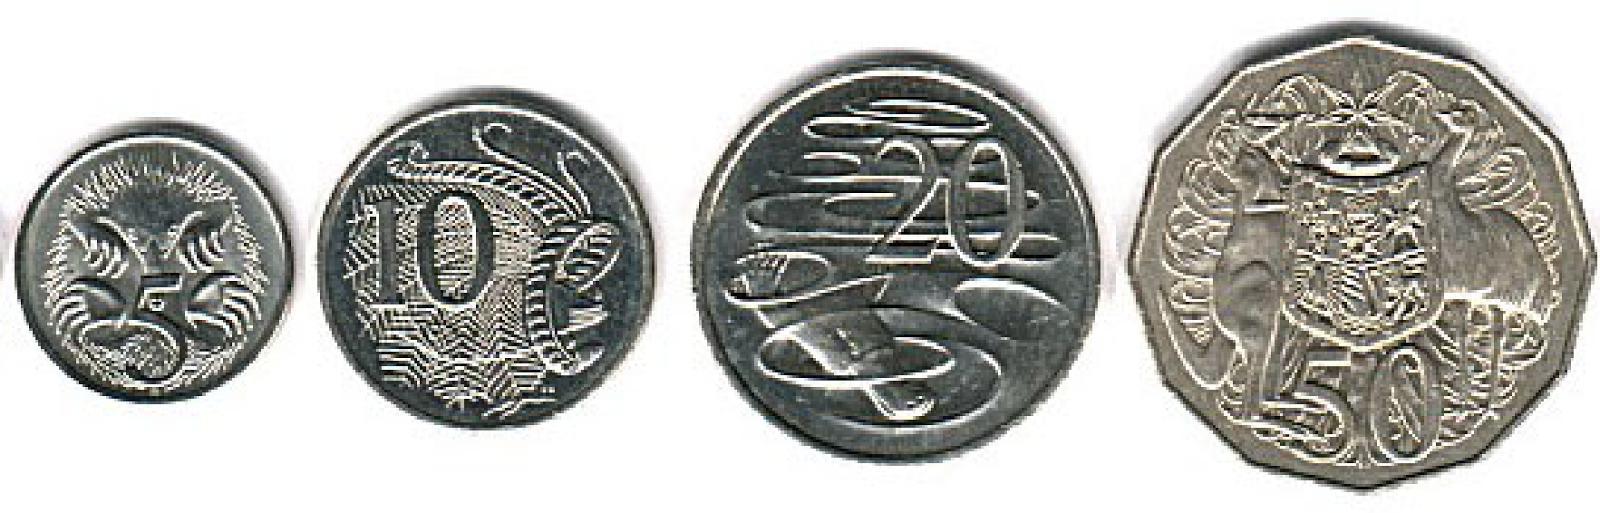 Australian Dollar Coins | www.imgkid.com - The Image Kid ...